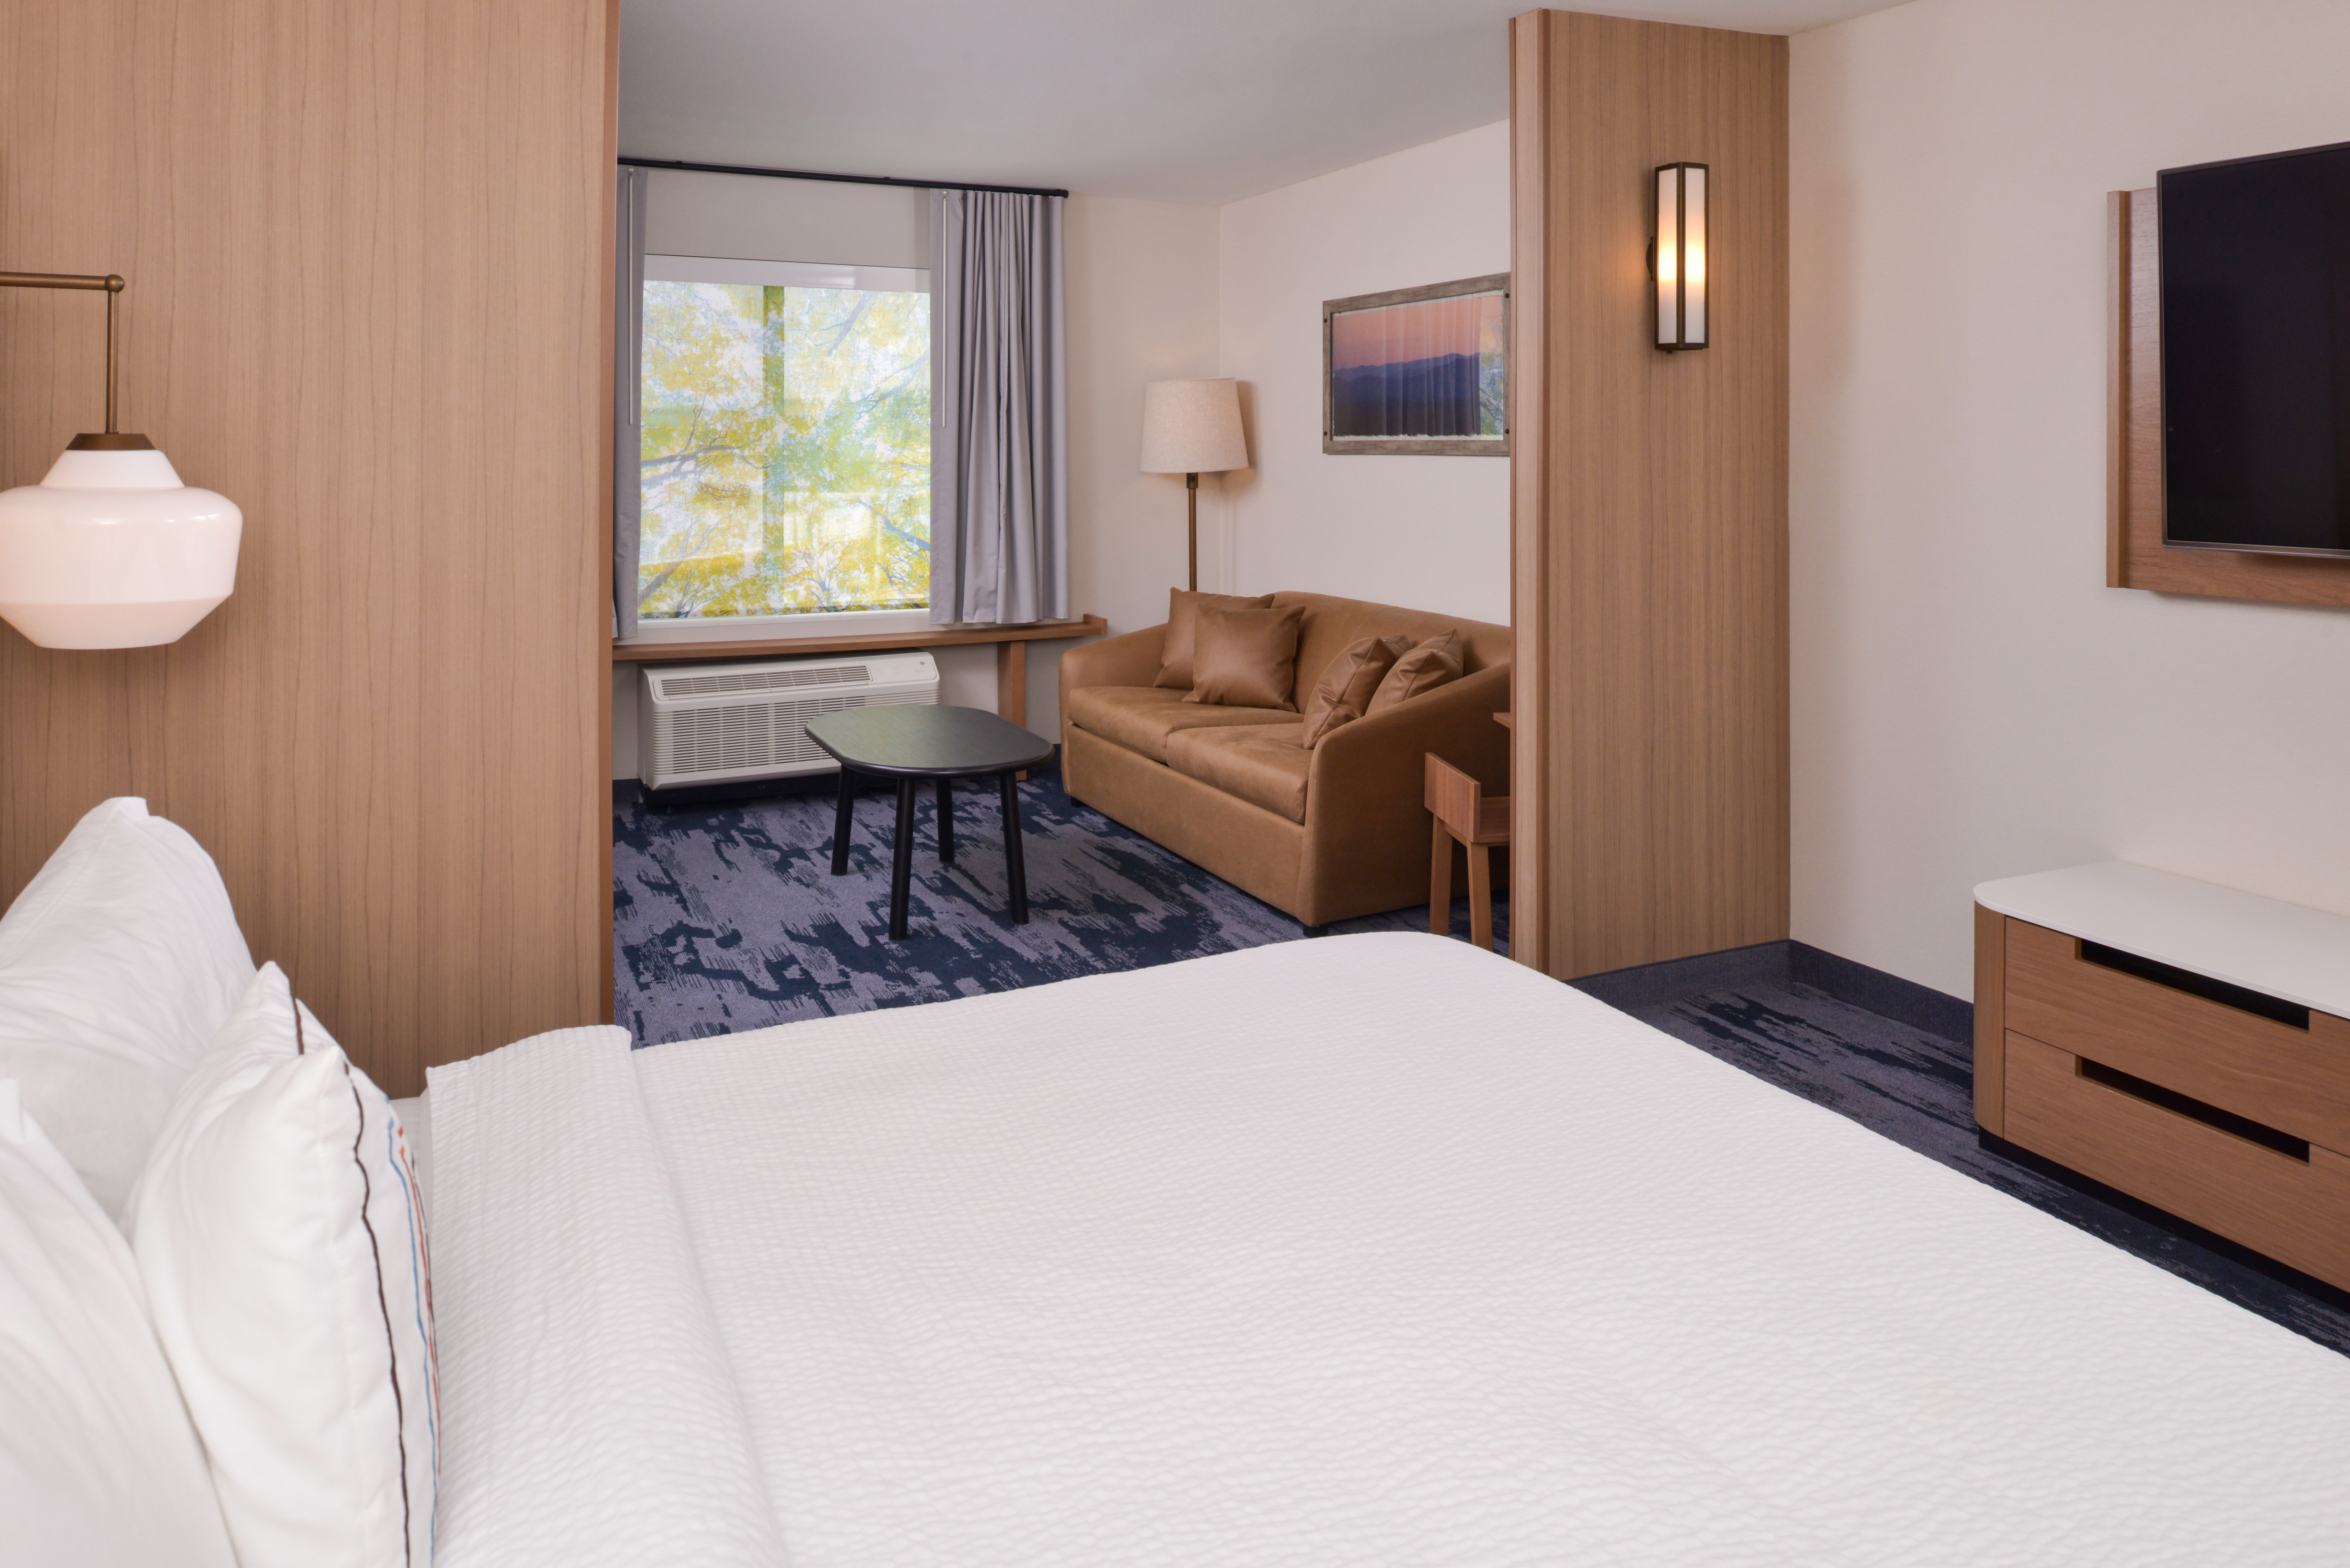 https://www.hotelsbyday.com/_data/default-hotel_image/3/15930/fis-cmhfg-kingsofabe-c4ixk.jpg